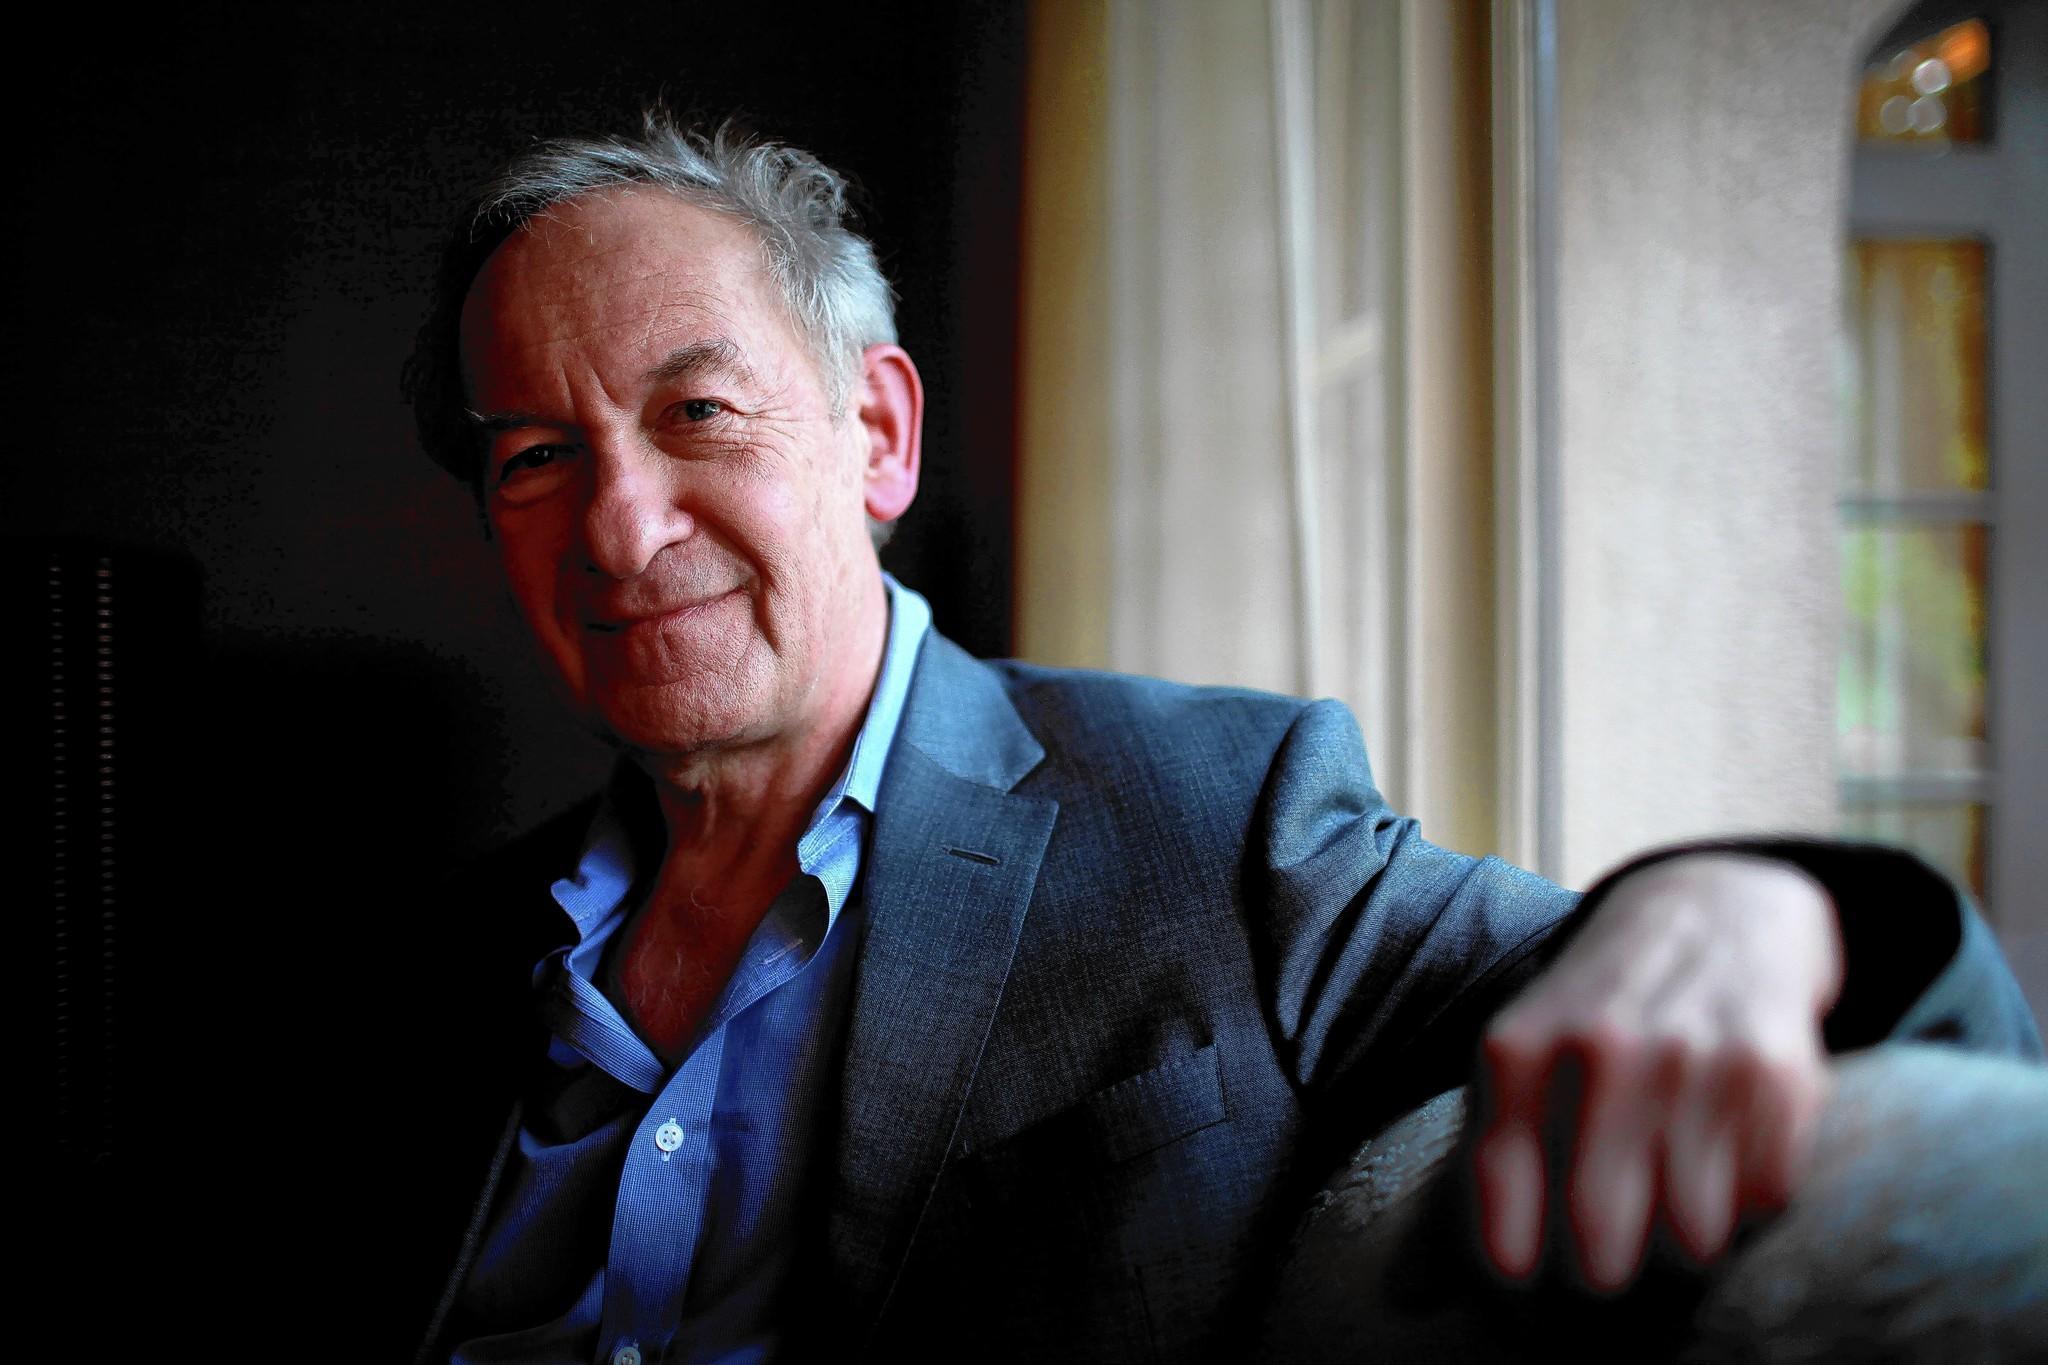 Historian Simon Scharma